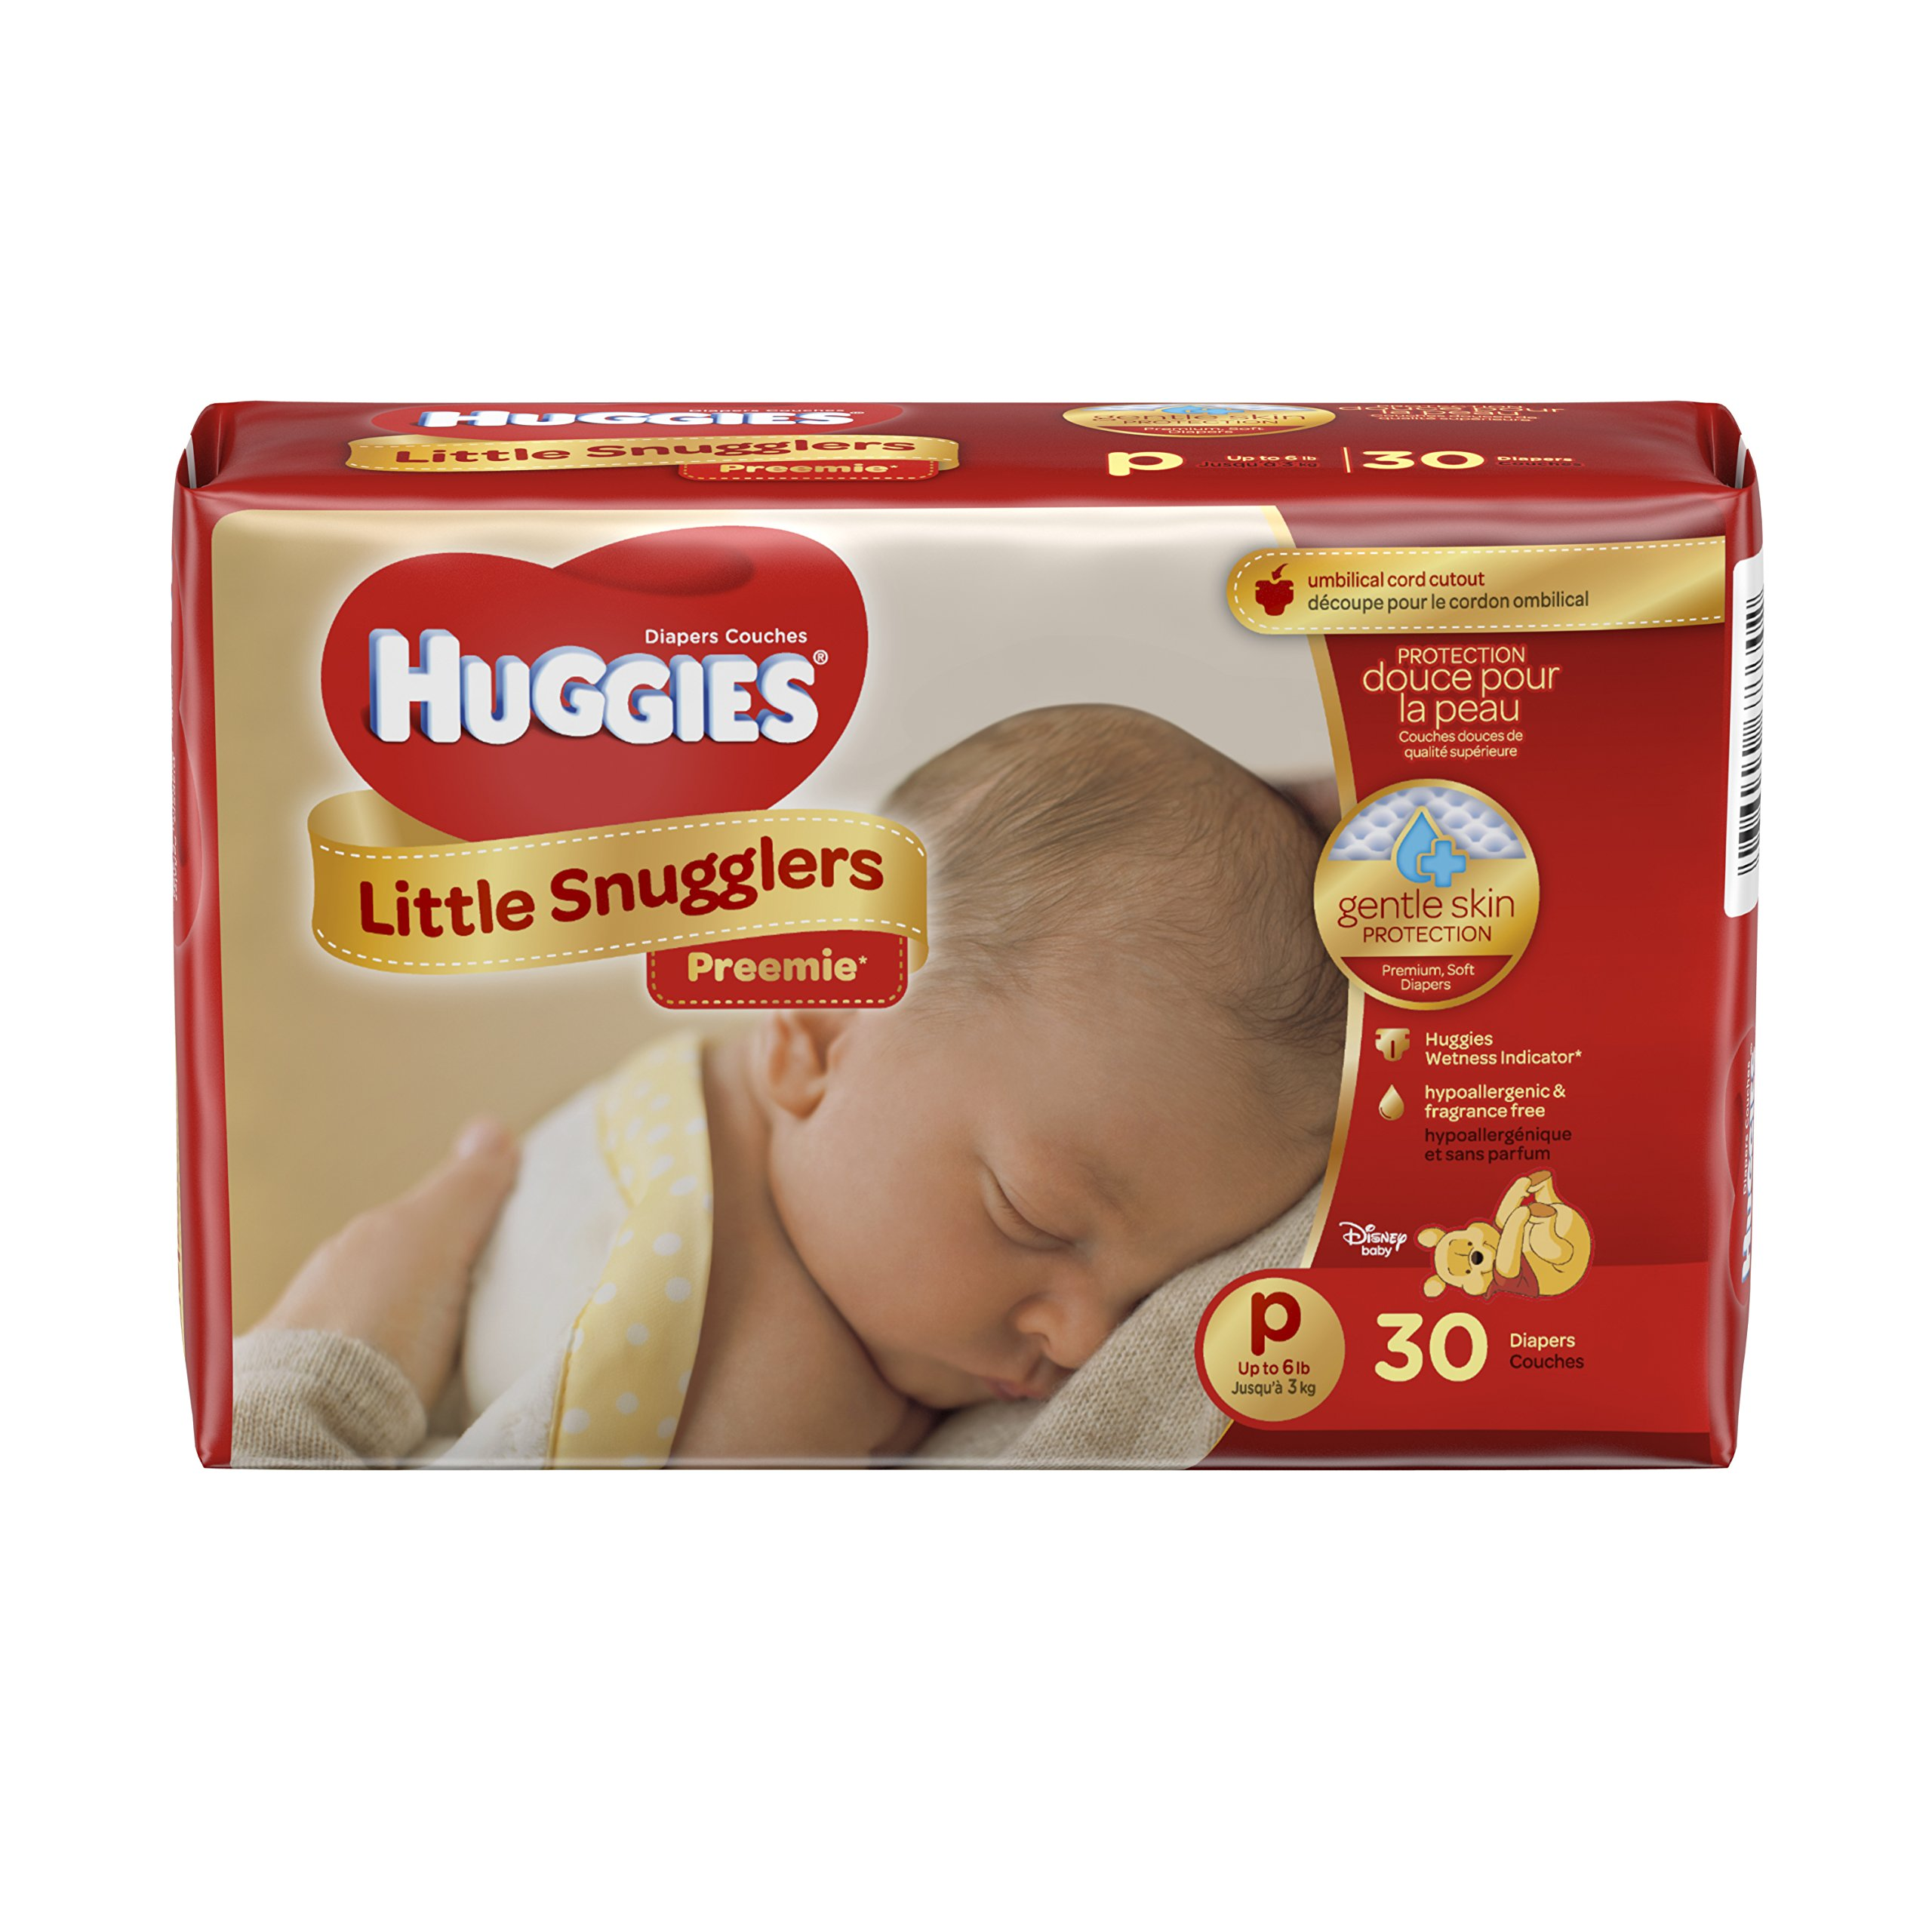 Huggies Little Snugglers Baby Diapers, Size Preemie, 30 Count (Pack of 2)